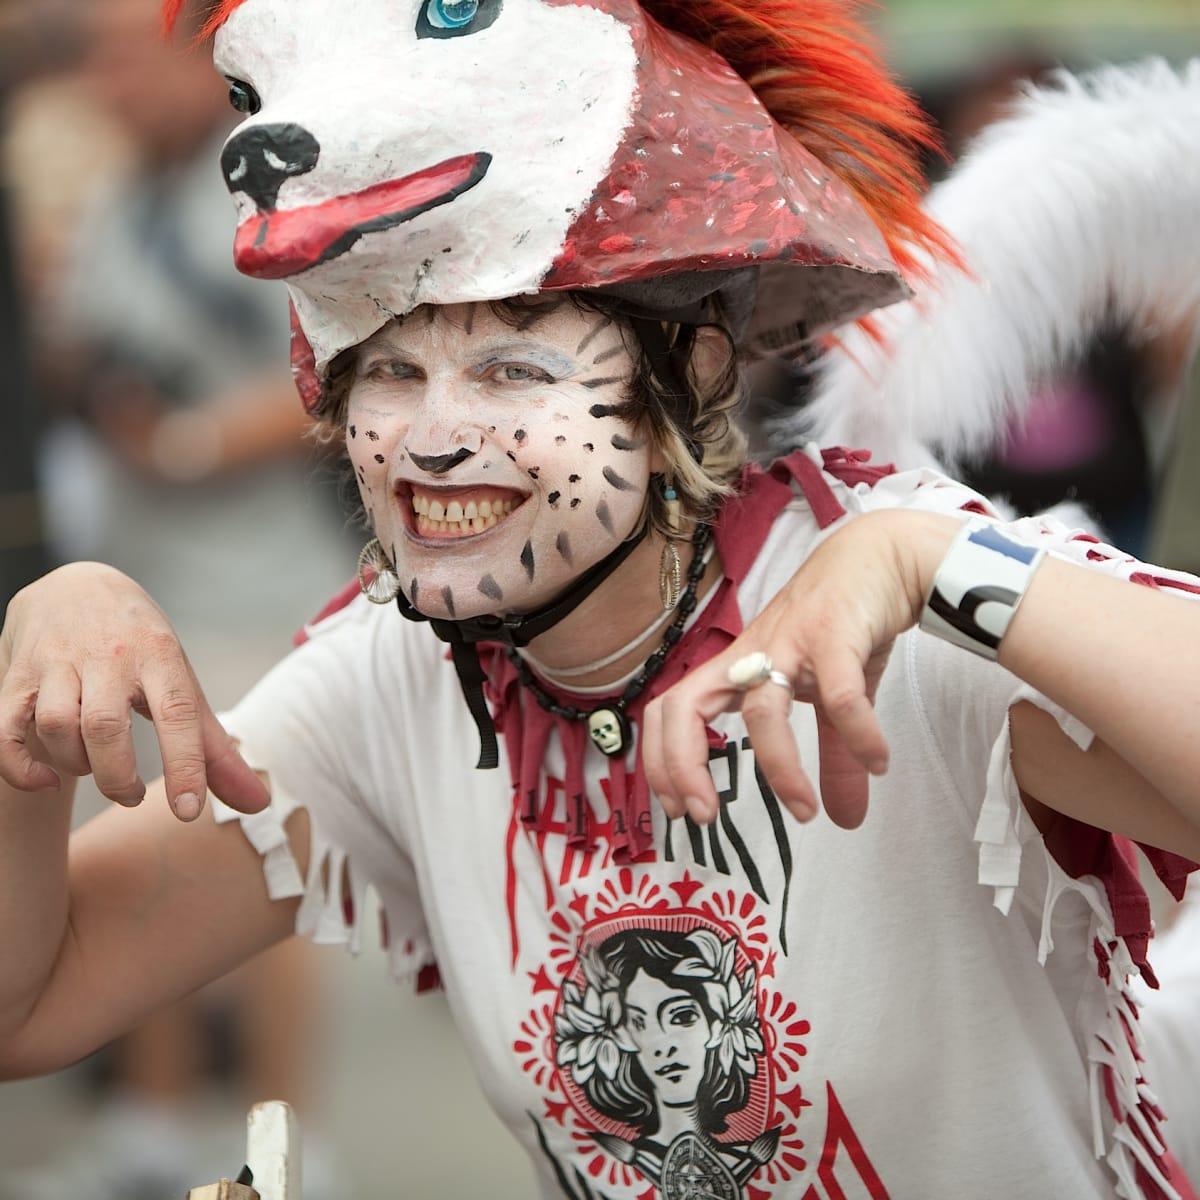 News_Art_Car_Parade_costume_painted face